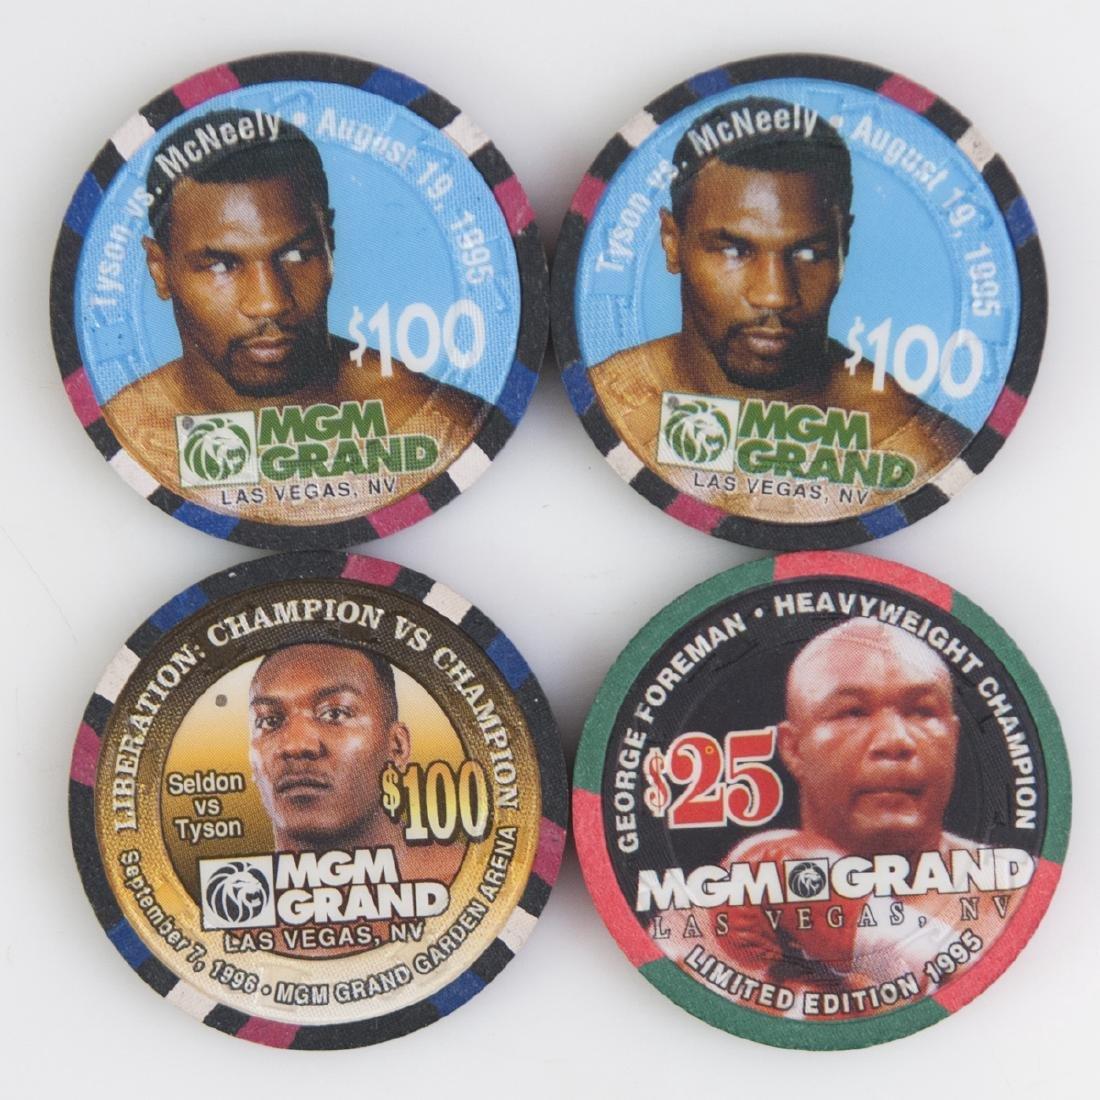 MGM Grand Casino Chips